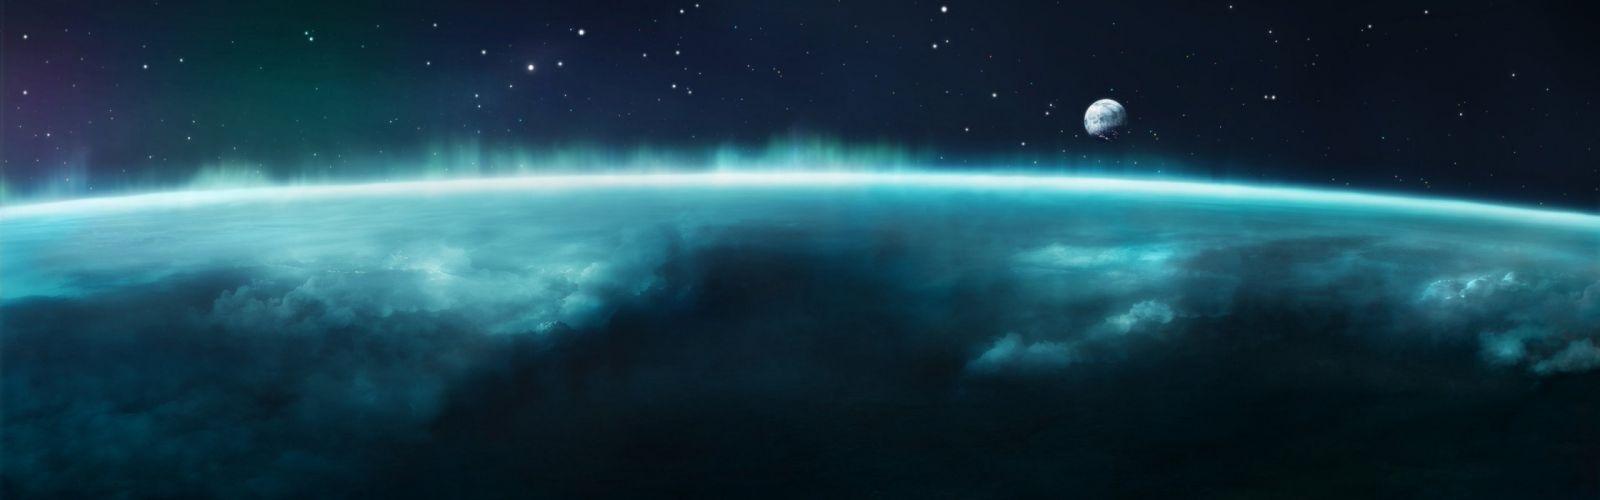 outer space planets aurora borealis wallpaper